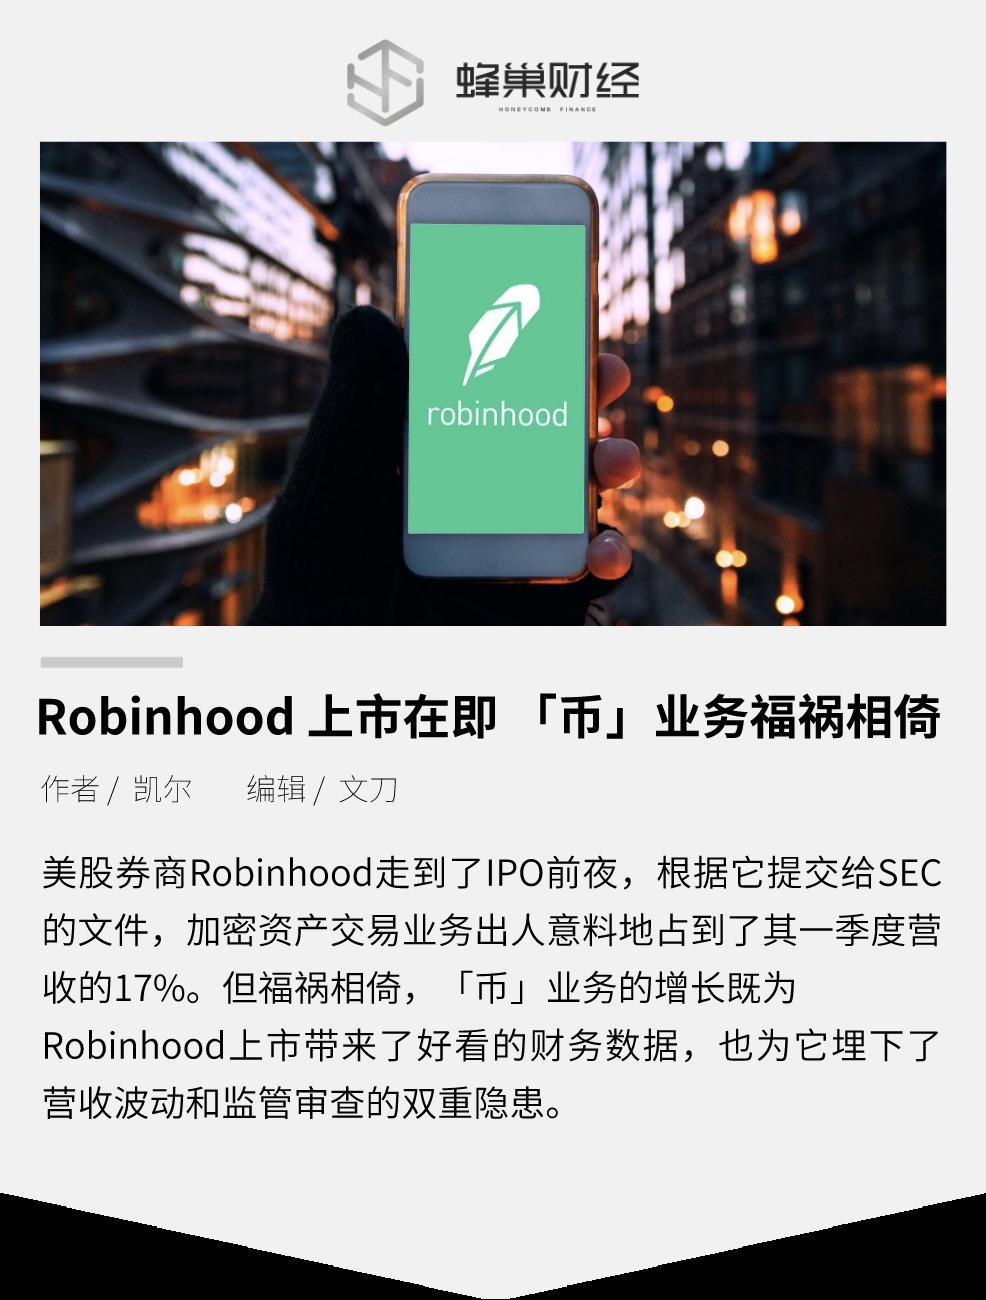 Robinhood 上市在即 涉「币」业务是福还是祸?